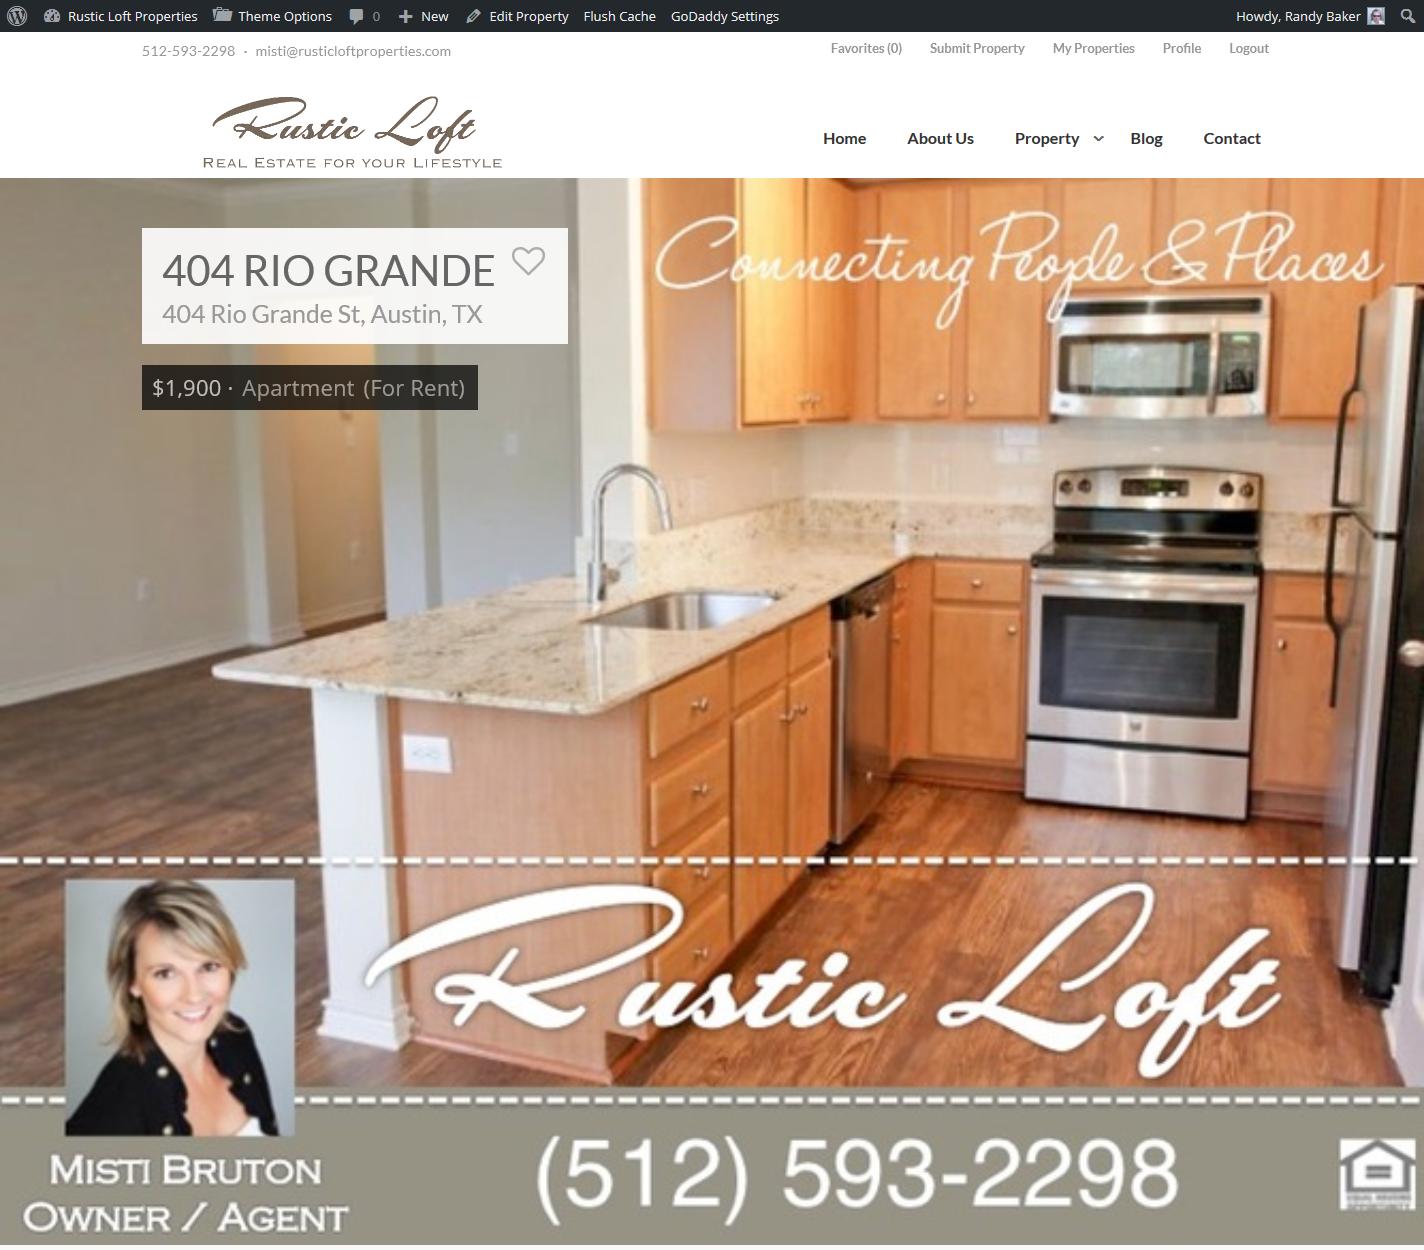 Rustic Loft Properties